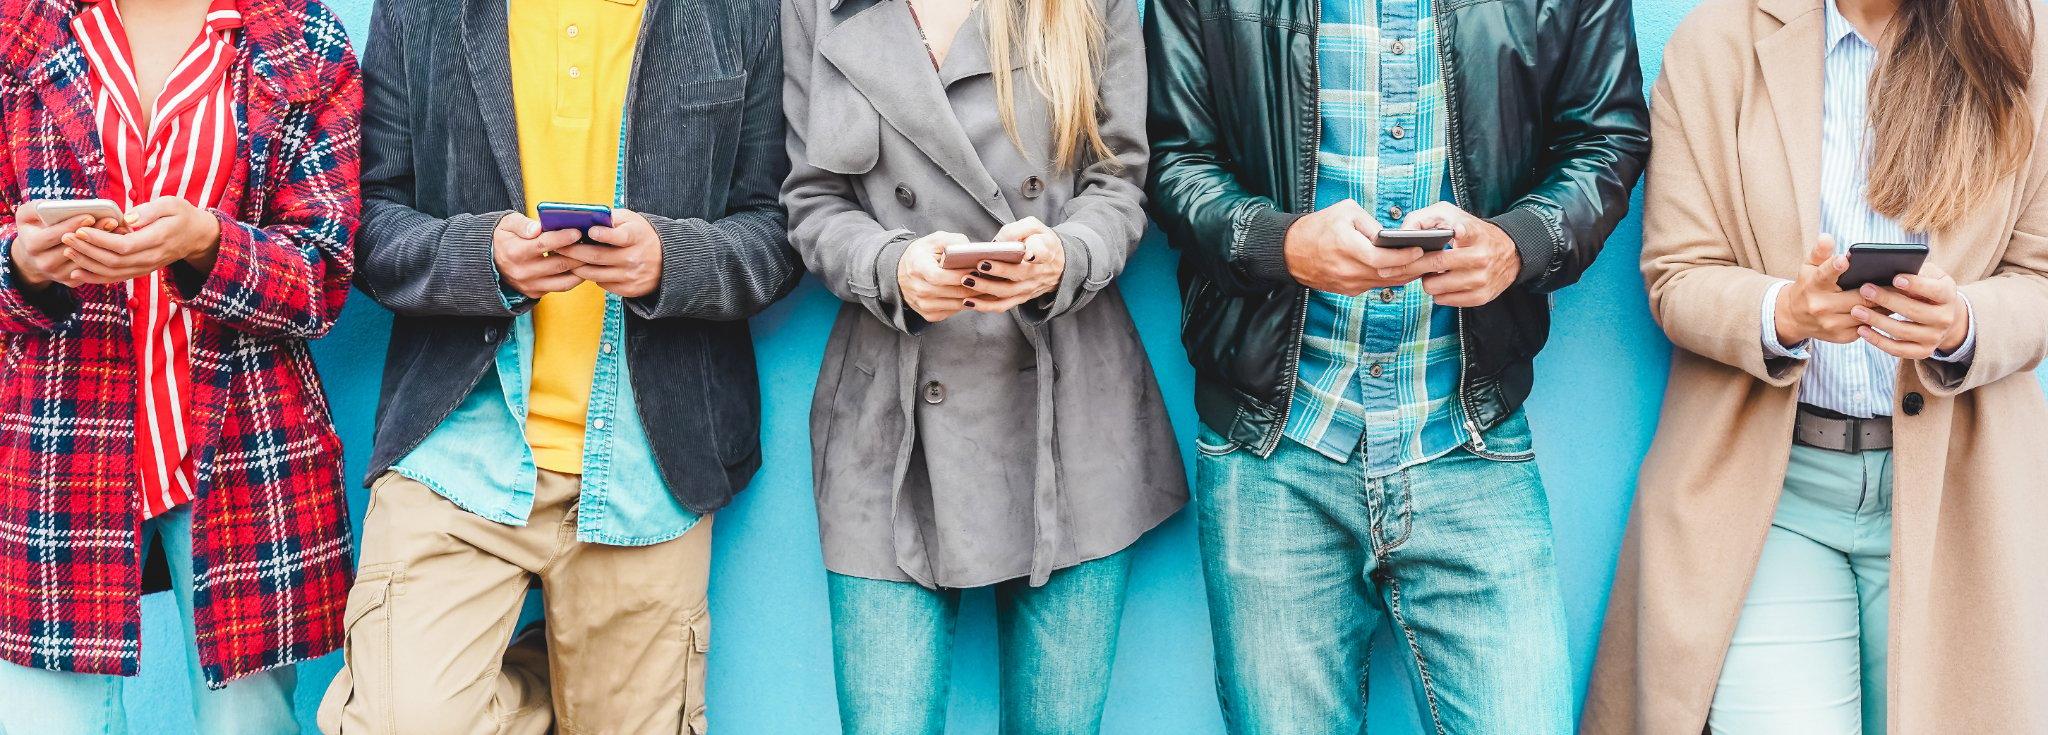 socialmedia-line of people